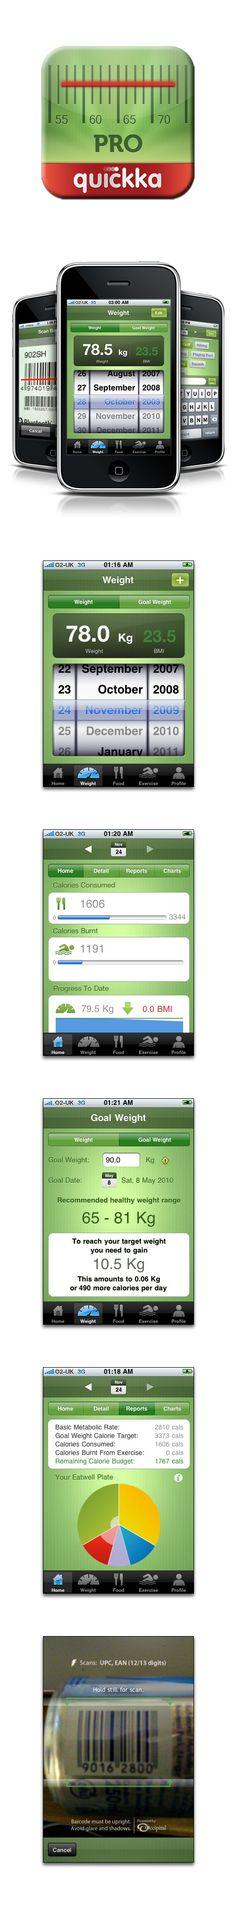 QuickkaCalories iPhone app by Ross MacKintosh, via Behance